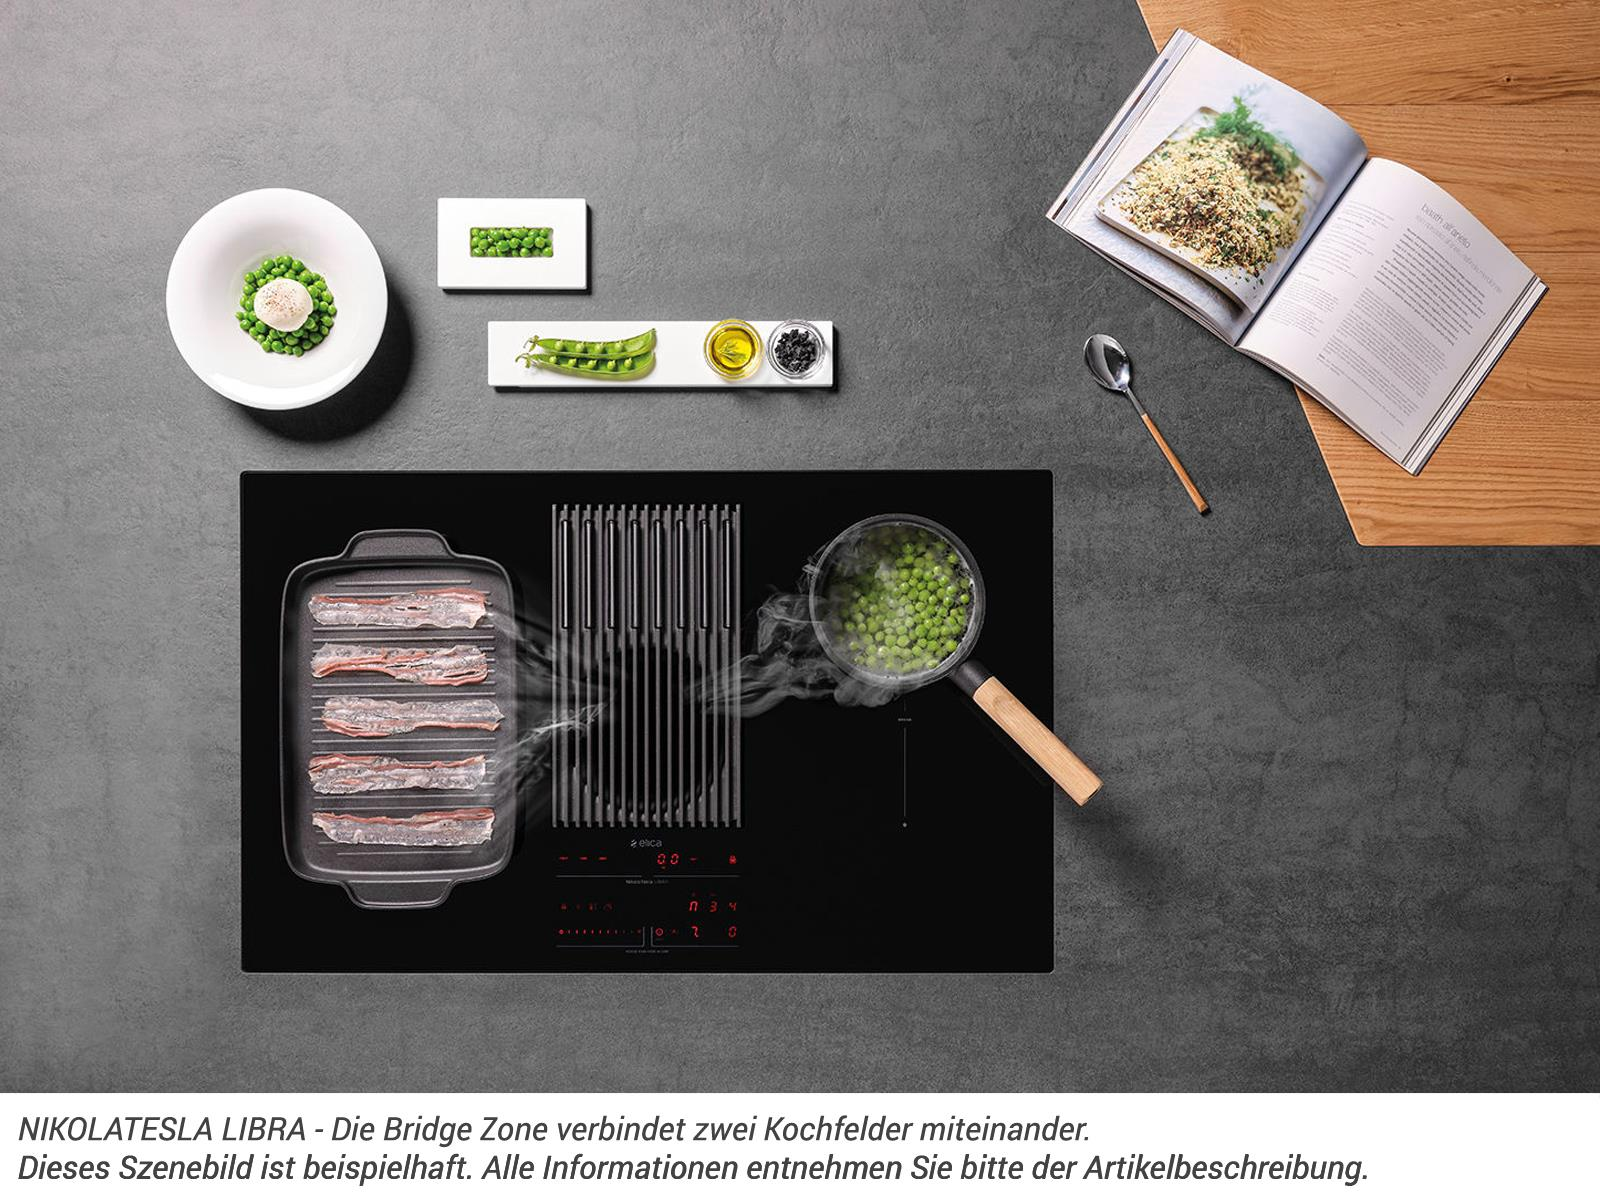 Elica NikolaTesla Libra PRF0147745 Induktionskochfeld-Dunstabzug-Kombination Schwarz mit integrierter Waage